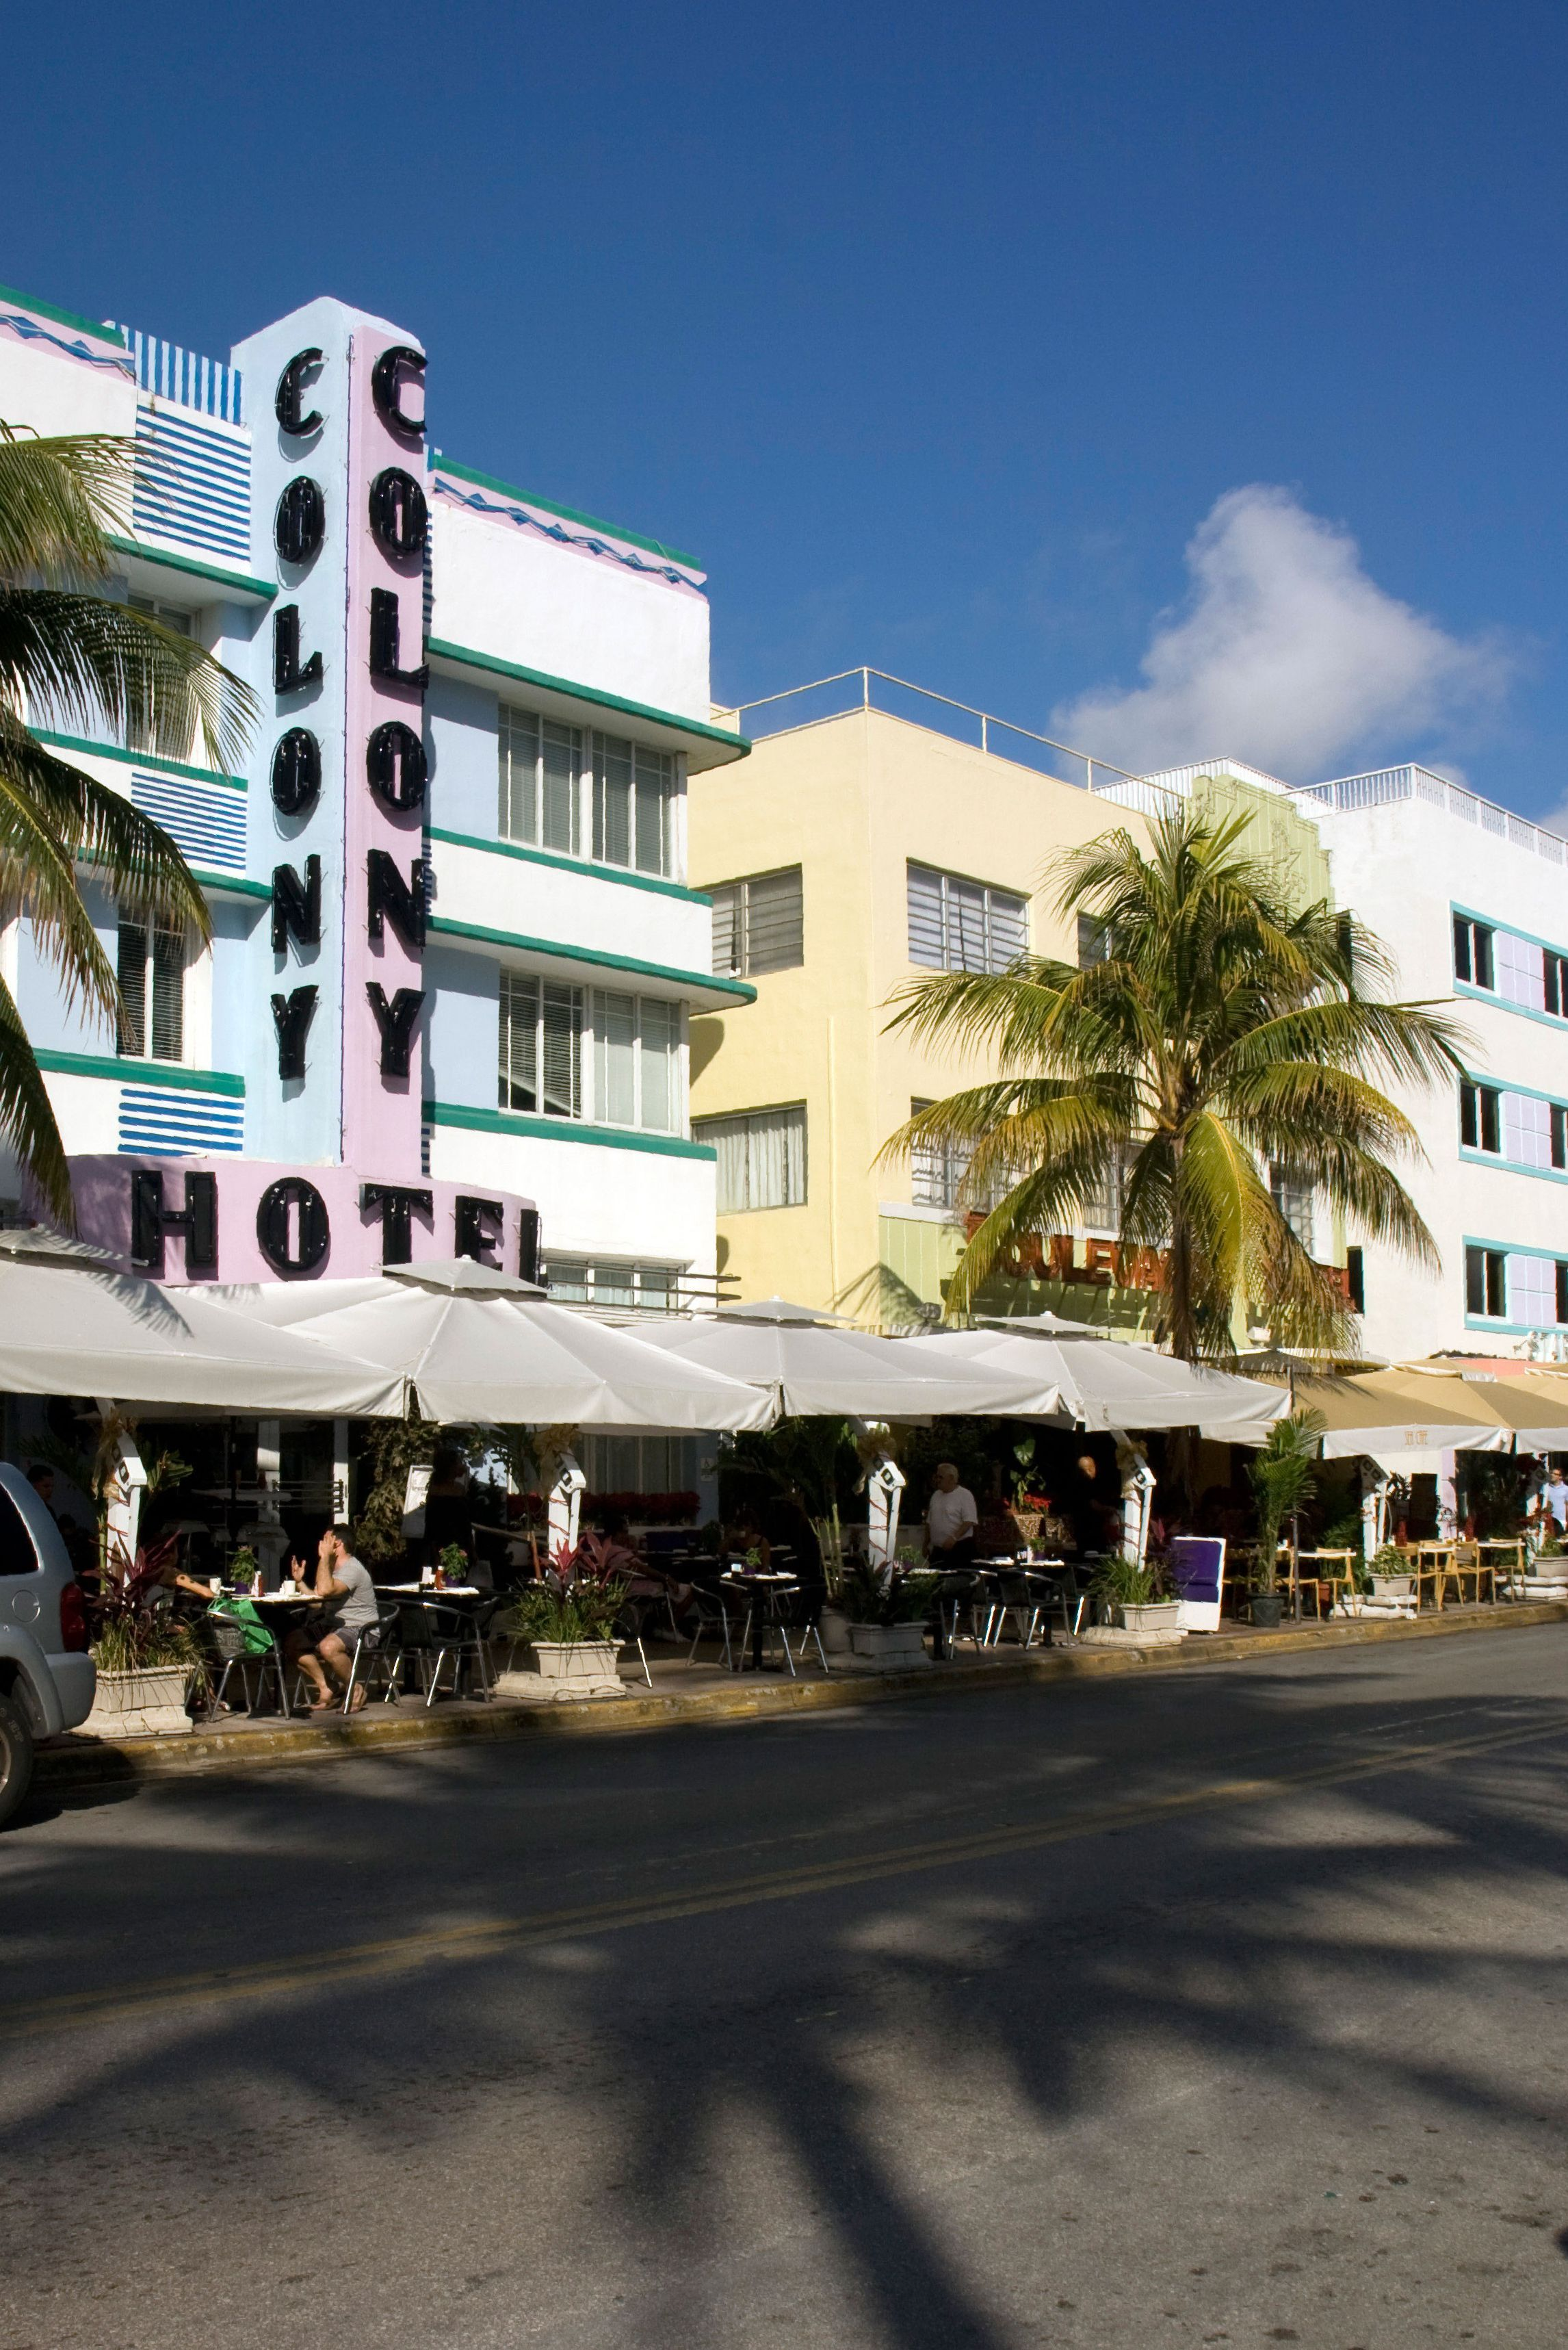 0fb24688ff3a3c60ef6ad1a890293223 - How Far Is Miami Beach From Miami Gardens